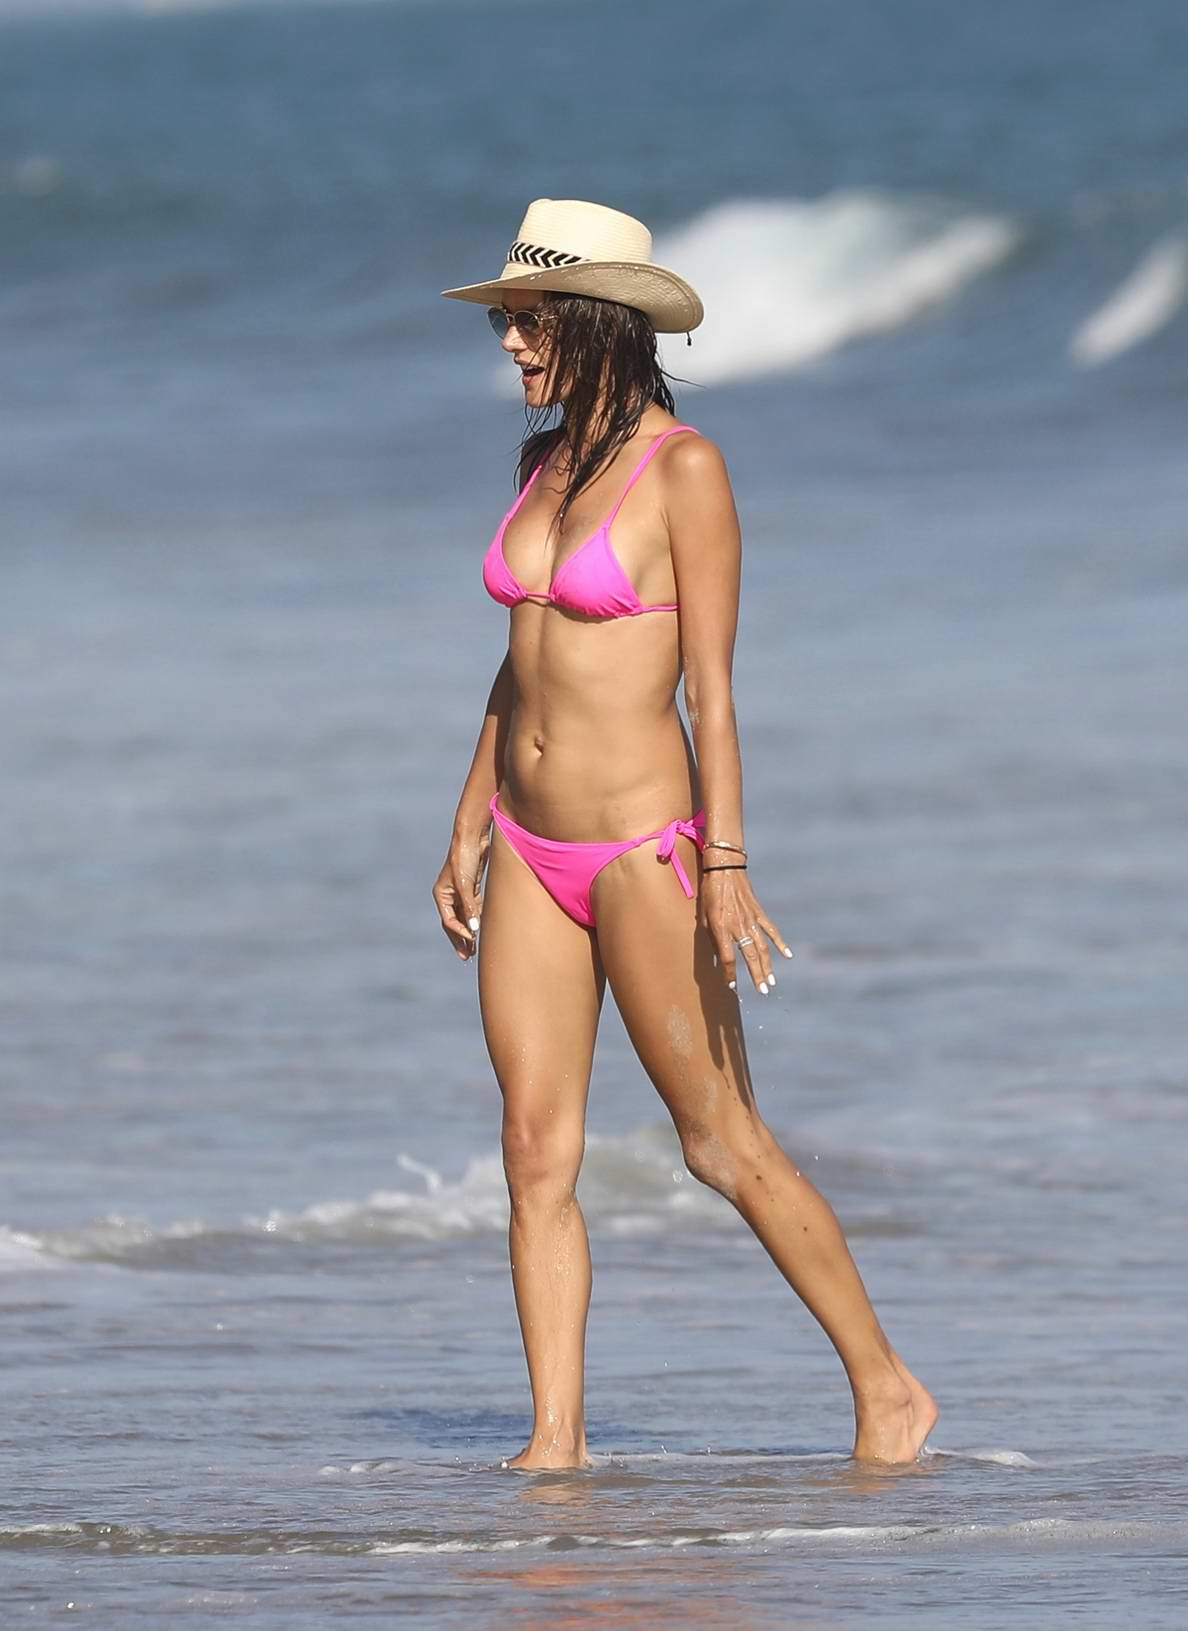 Alessandra Ambrosio in a Pink Bikini relaxing by the Beach in Malibu